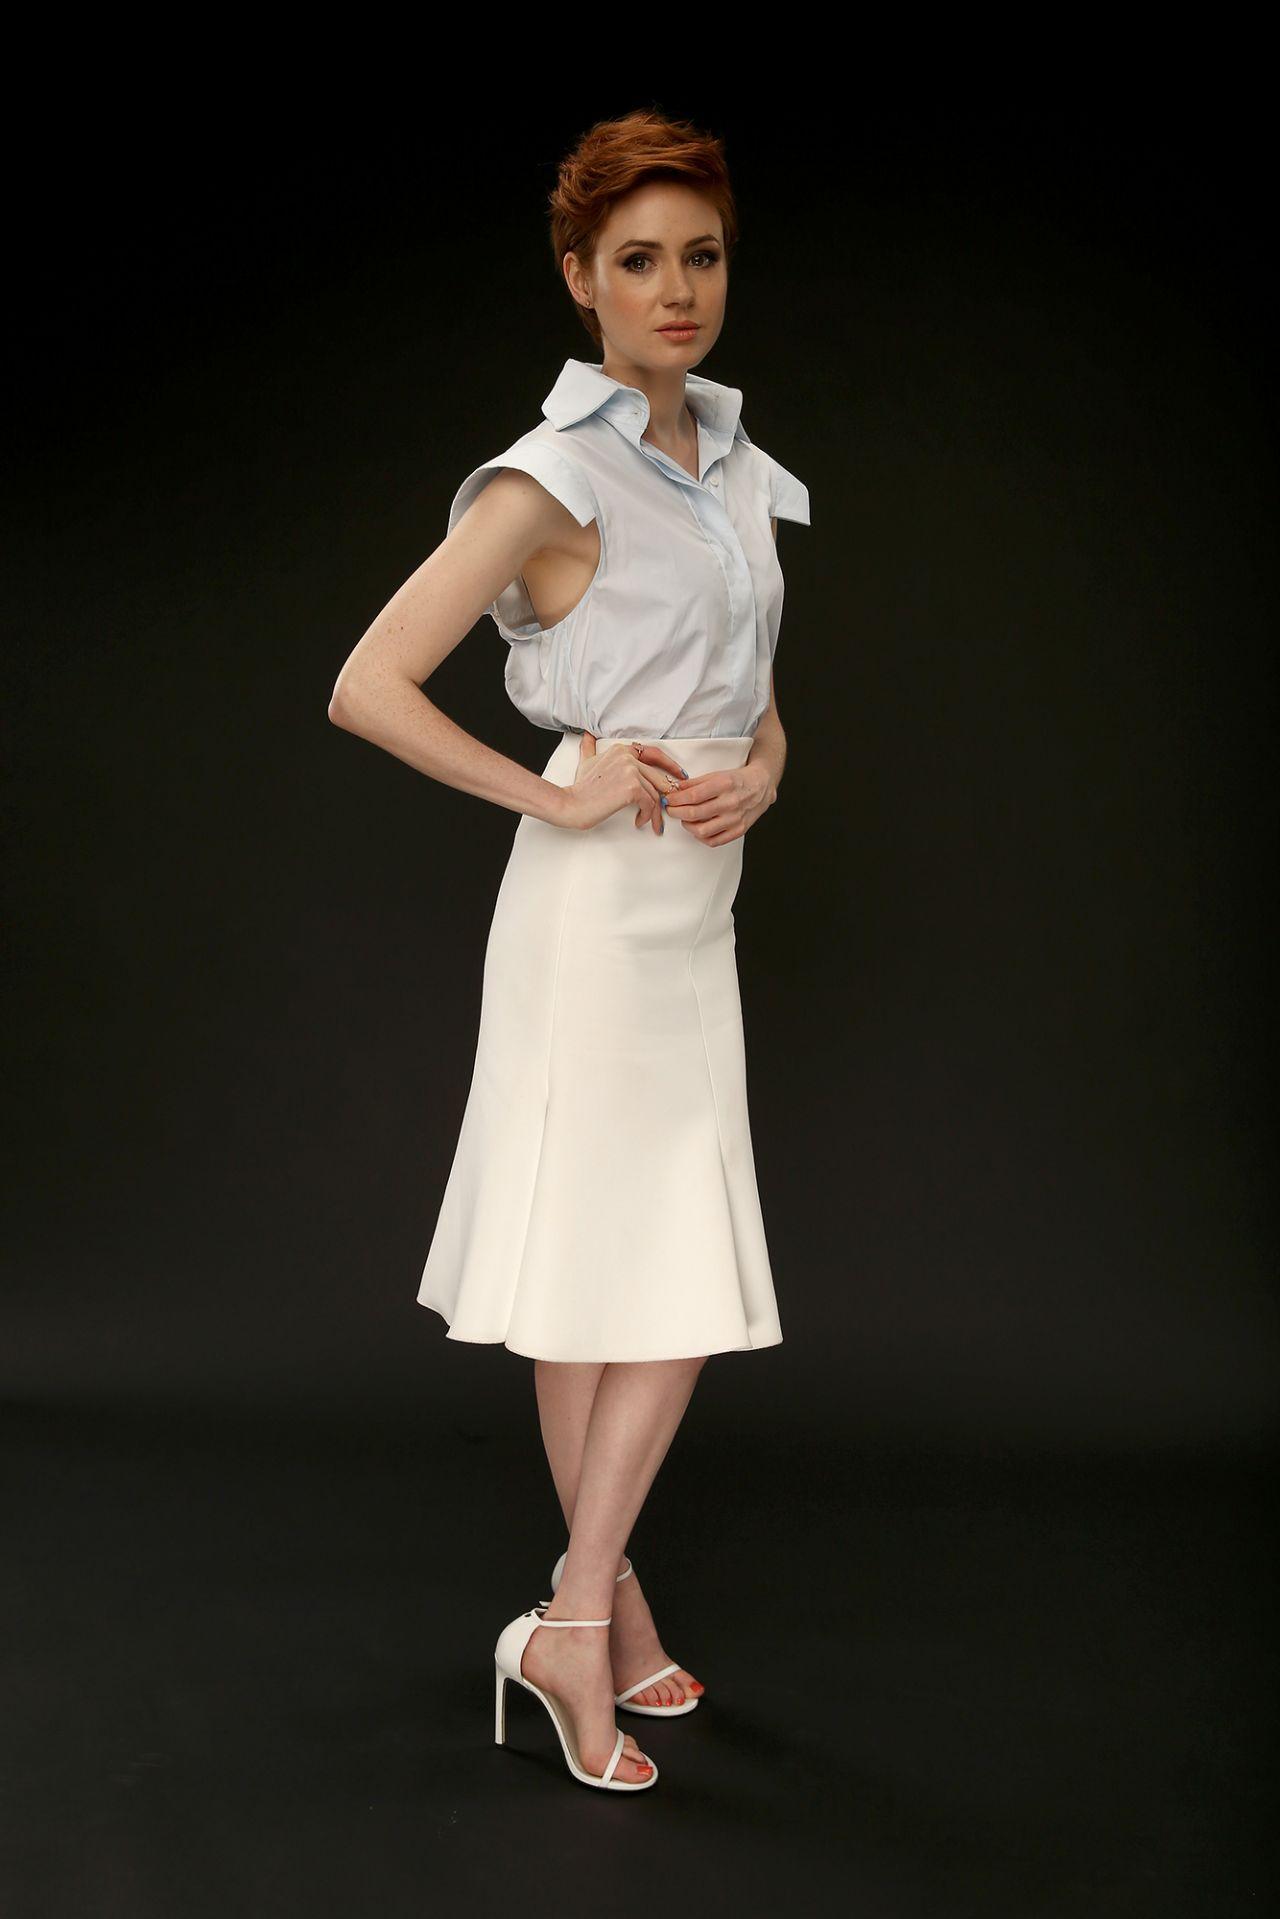 Karen Gillan Photoshoot for ABC Summer TCA 2014